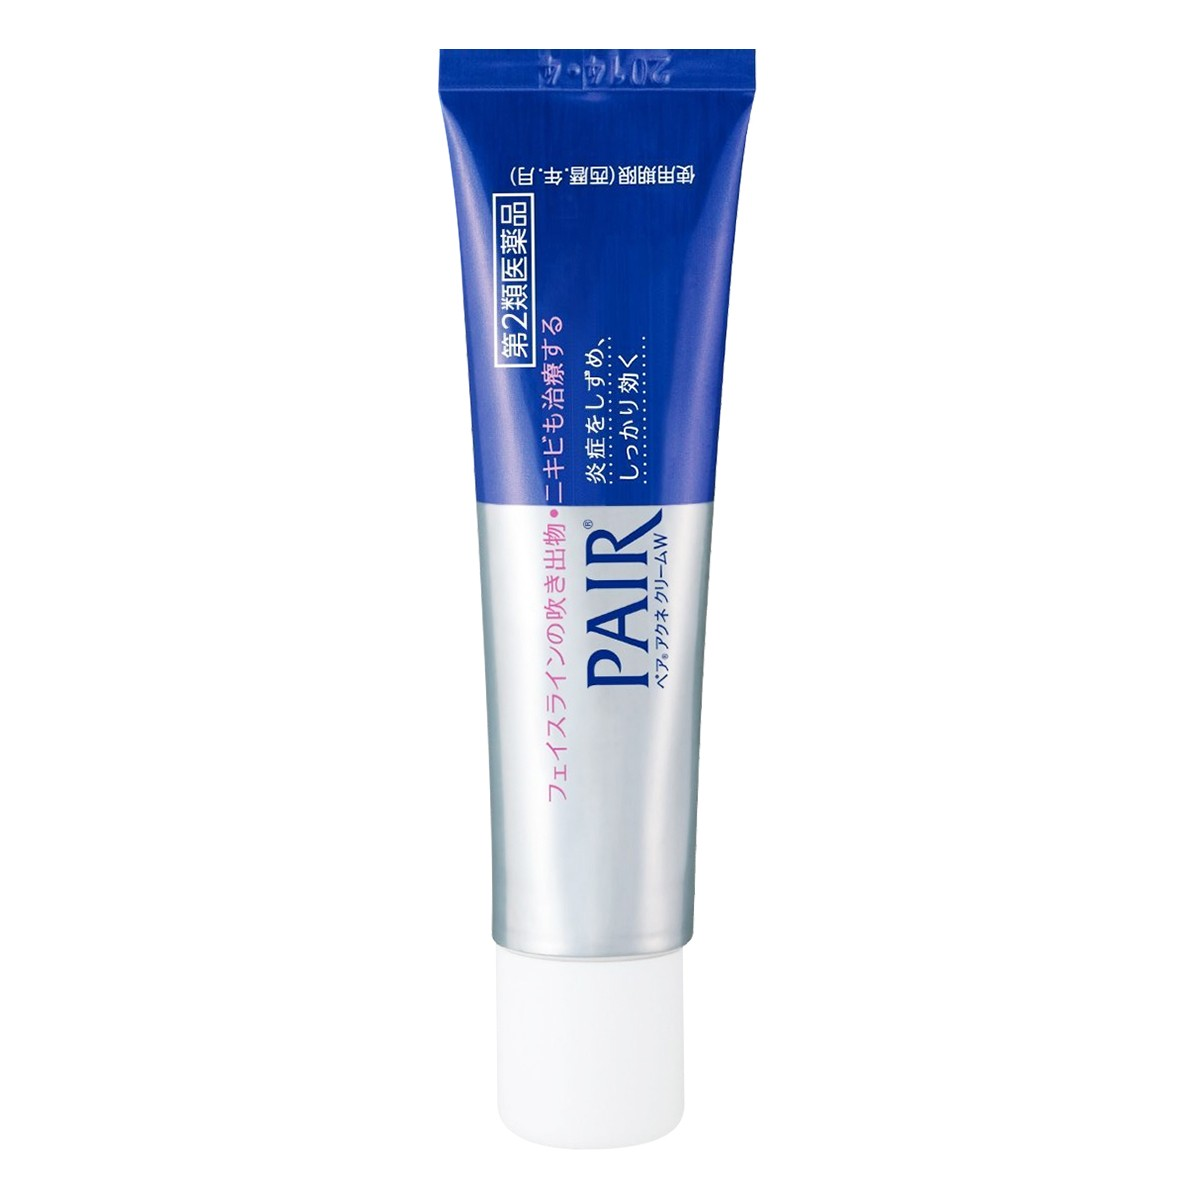 Yamibuy.com:Customer reviews:PAIR Acne Cream, 24g